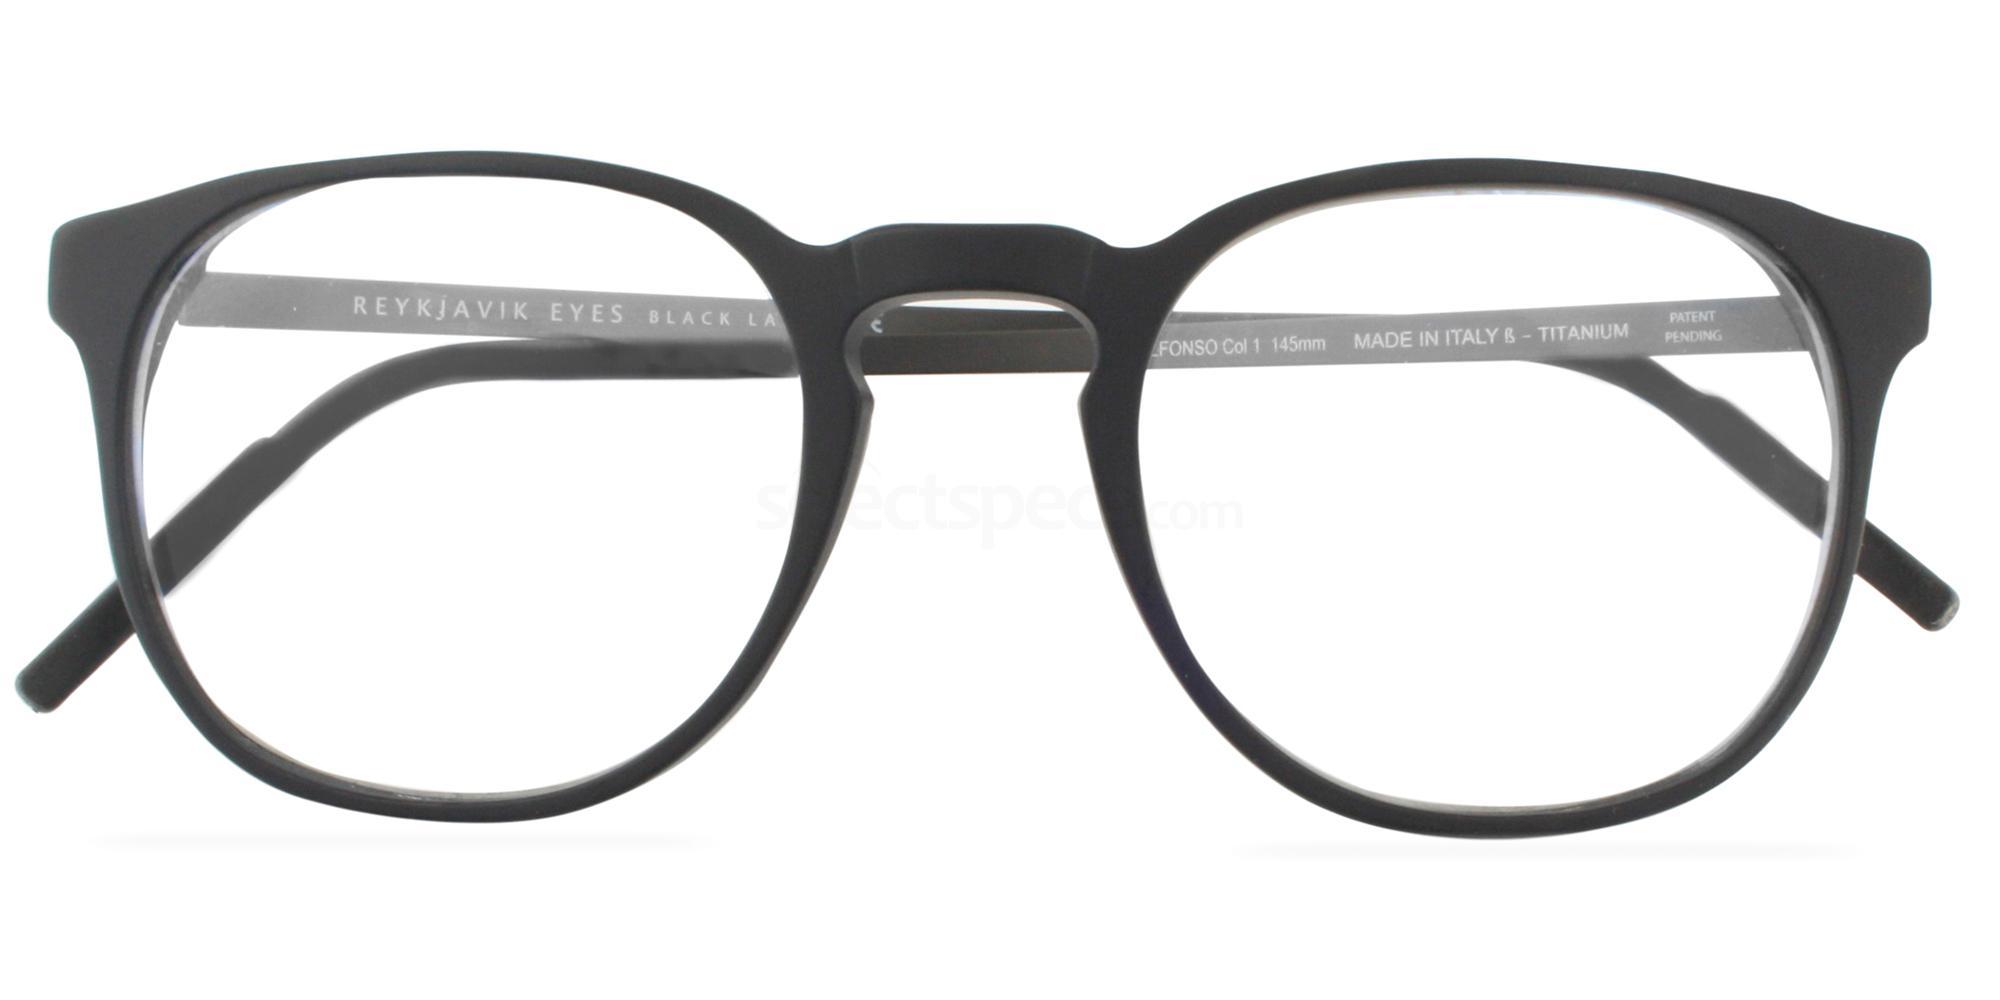 C1 ALFONSO Glasses, Reykjavik Eyes Black Label